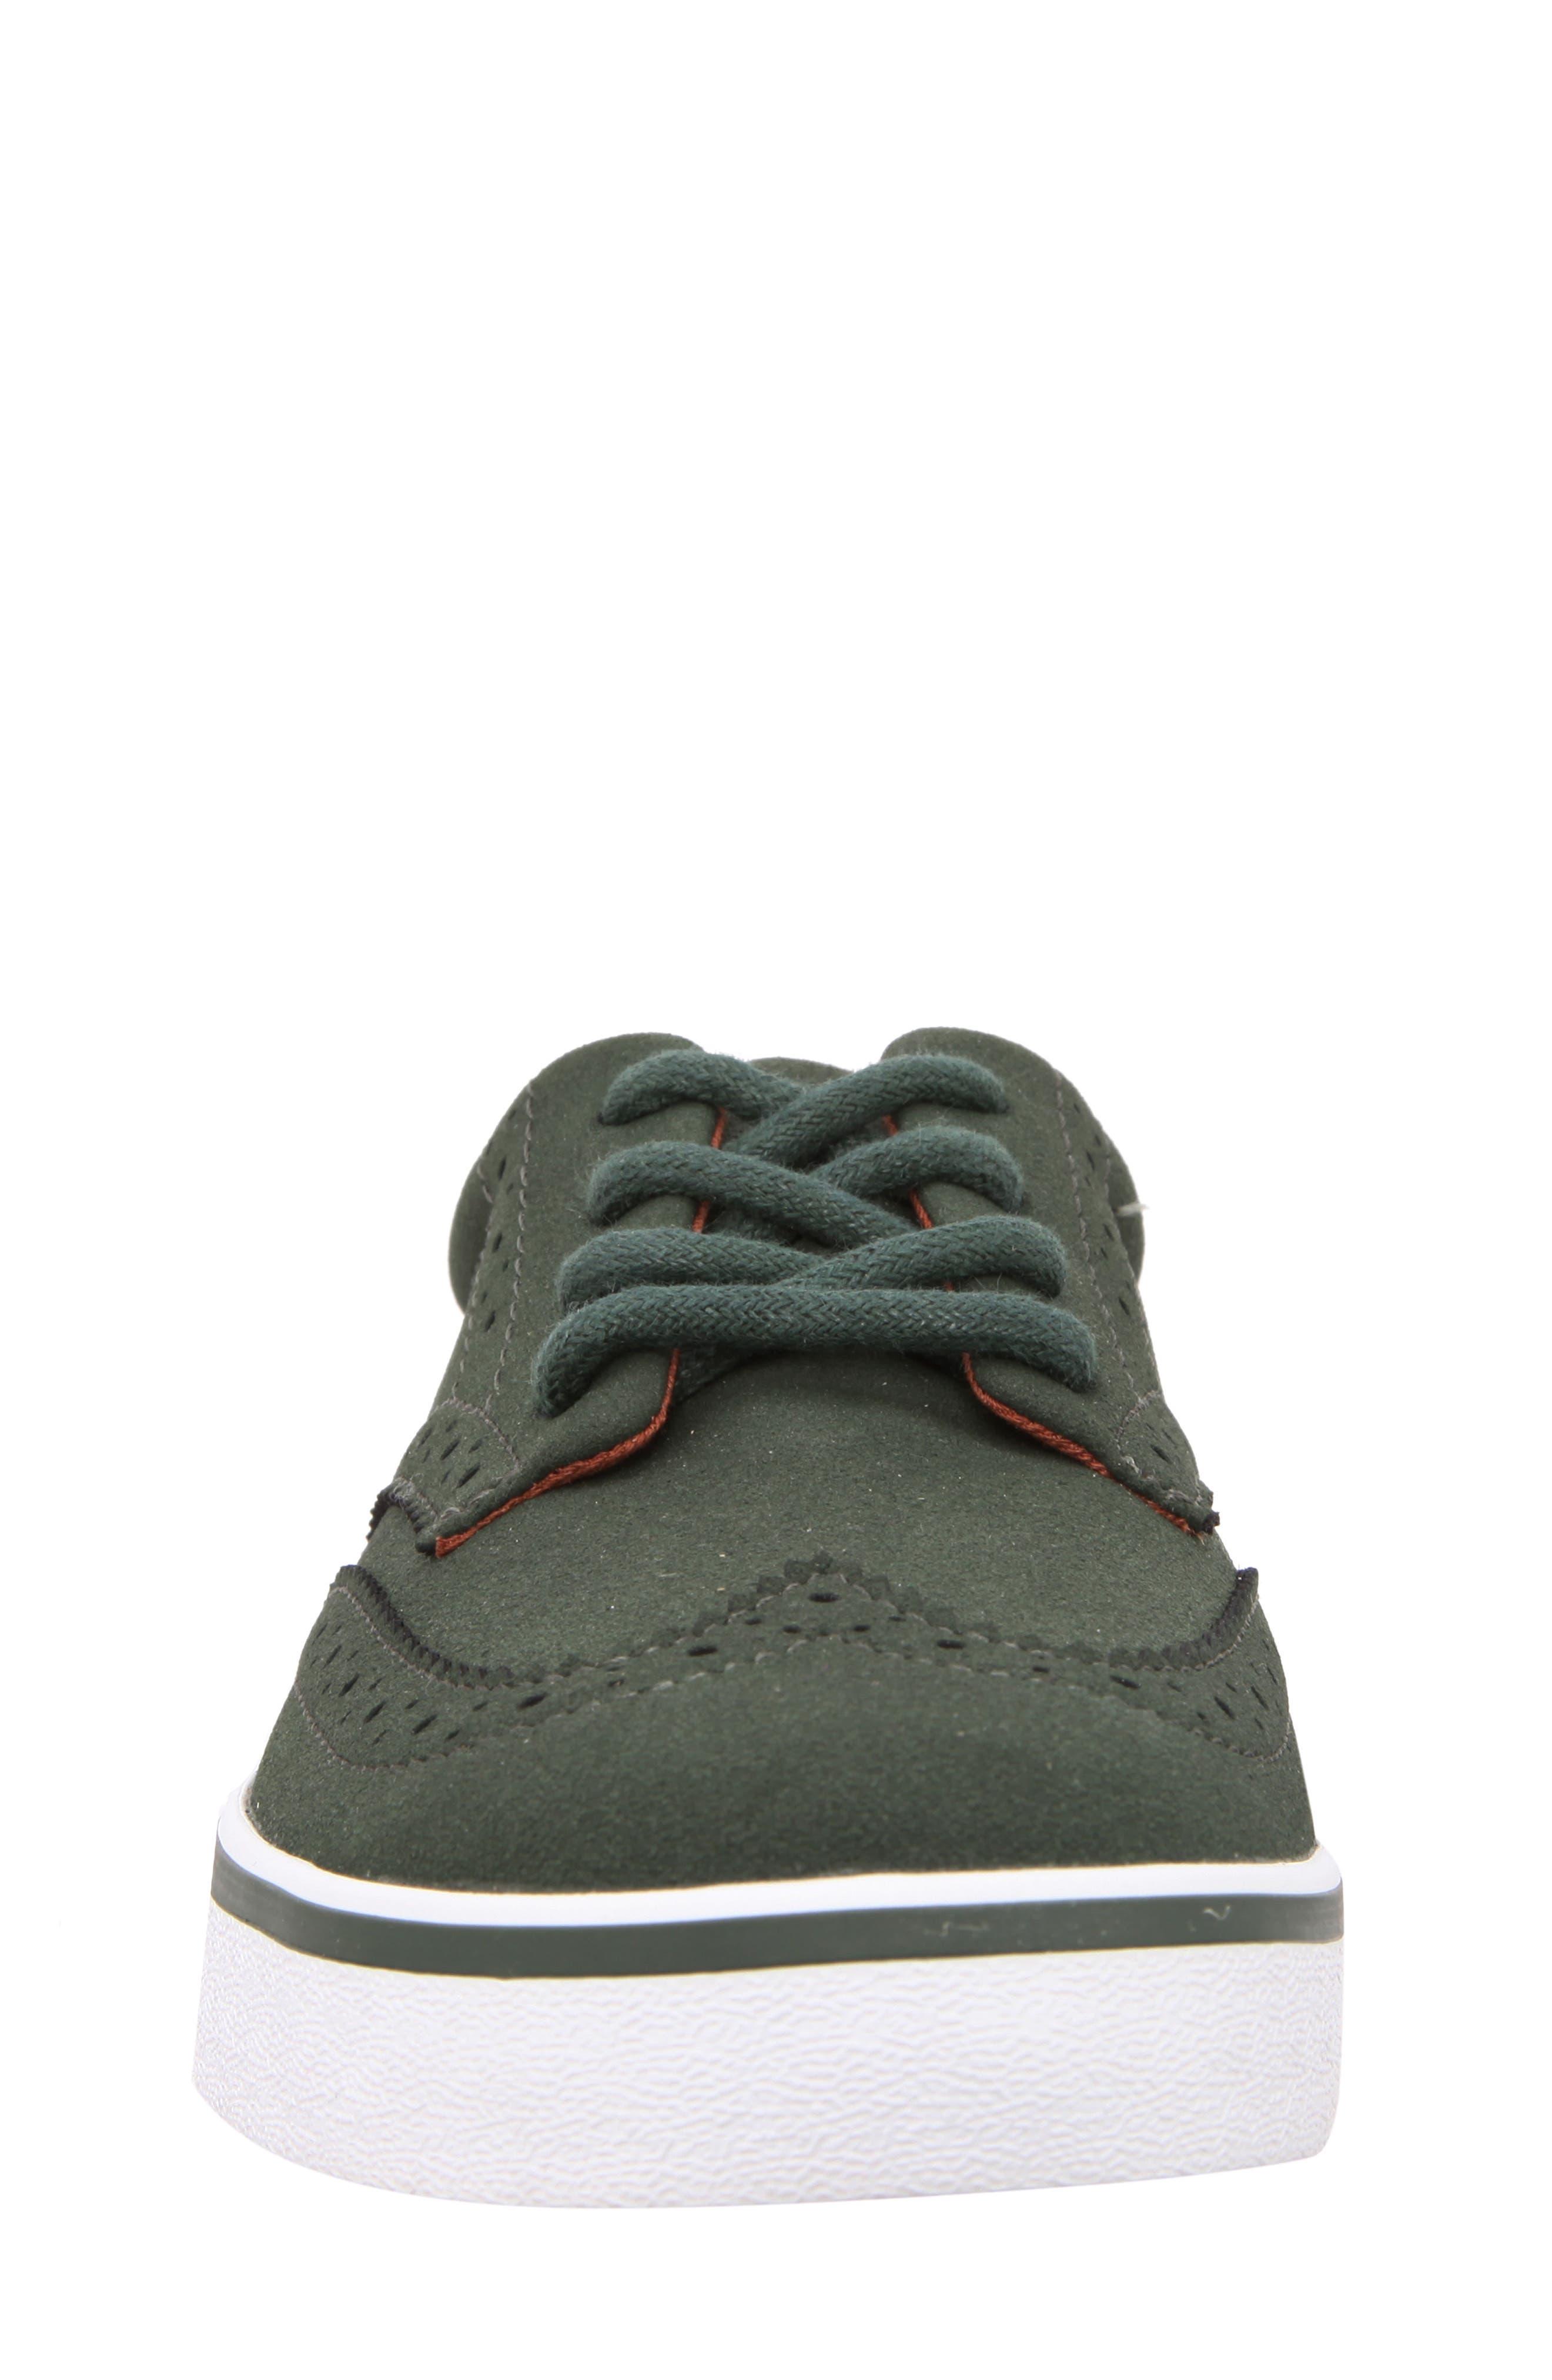 Wingtip Sneaker,                             Alternate thumbnail 4, color,                             Olive Faux Suede